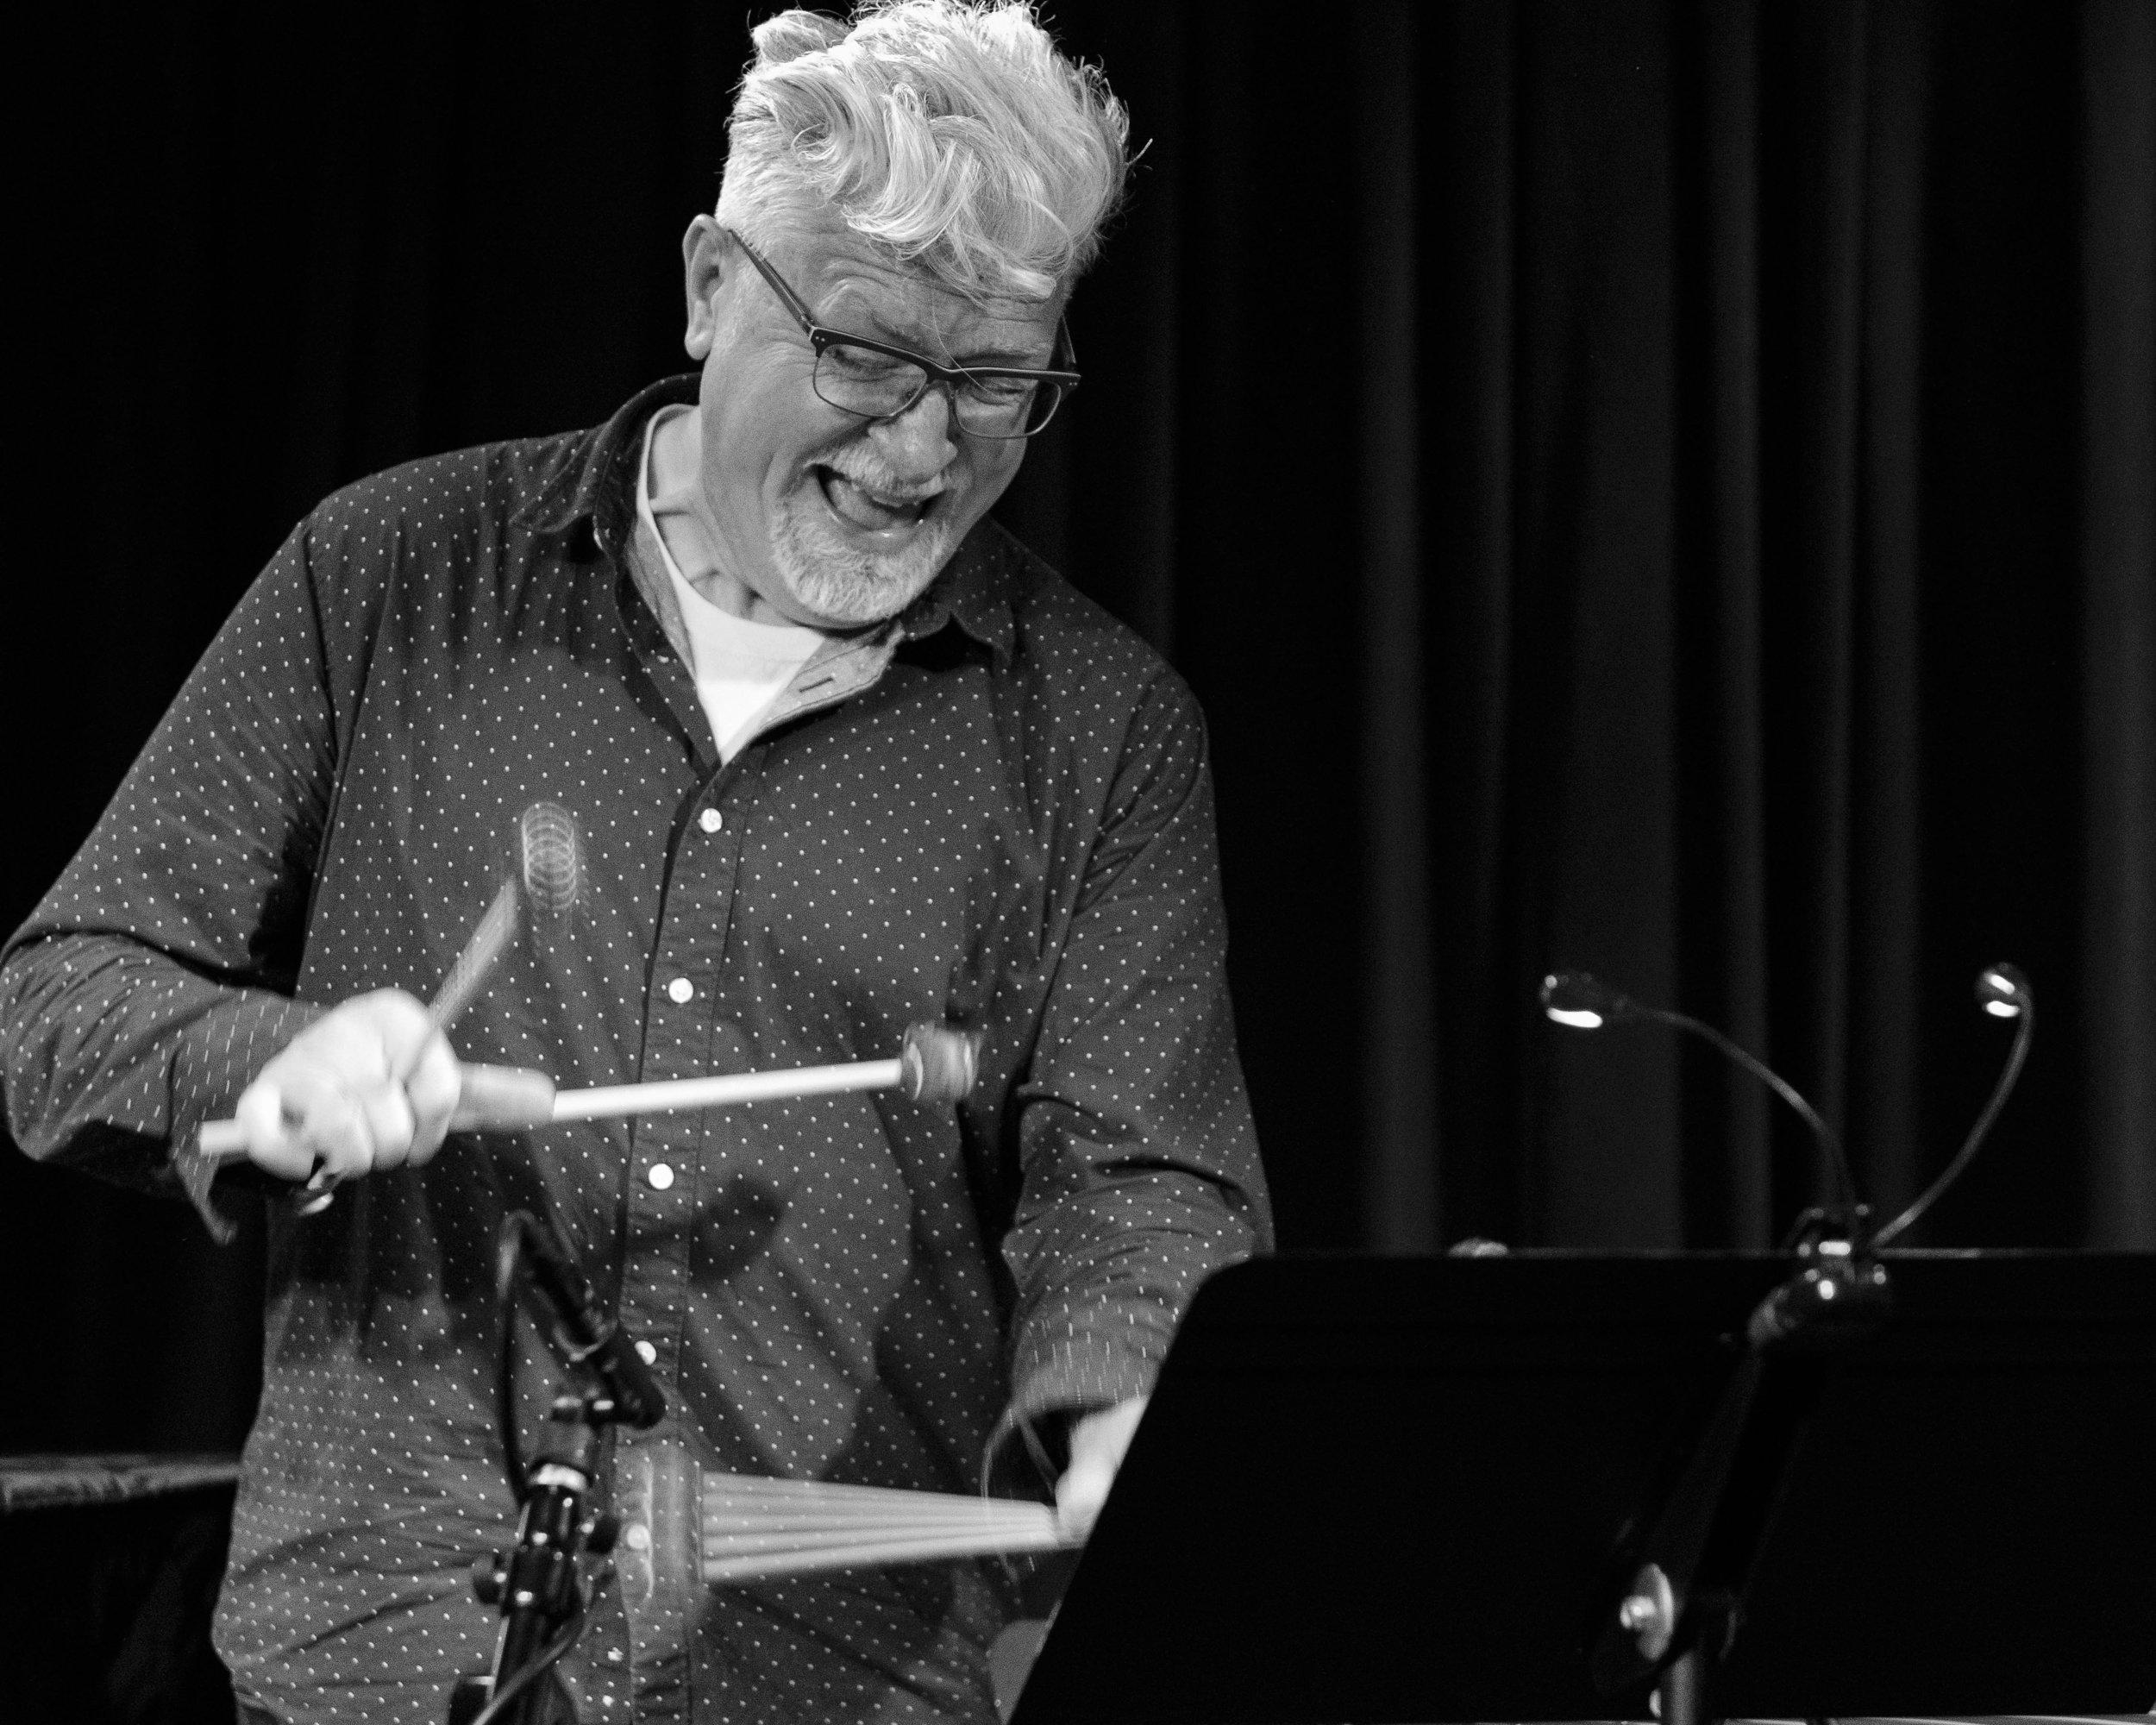 Brett Reed on vibes with Union 32 playing Scandinavian Jazz at The Nash Jazz Club - Joseph Berg Live Jazz Photography